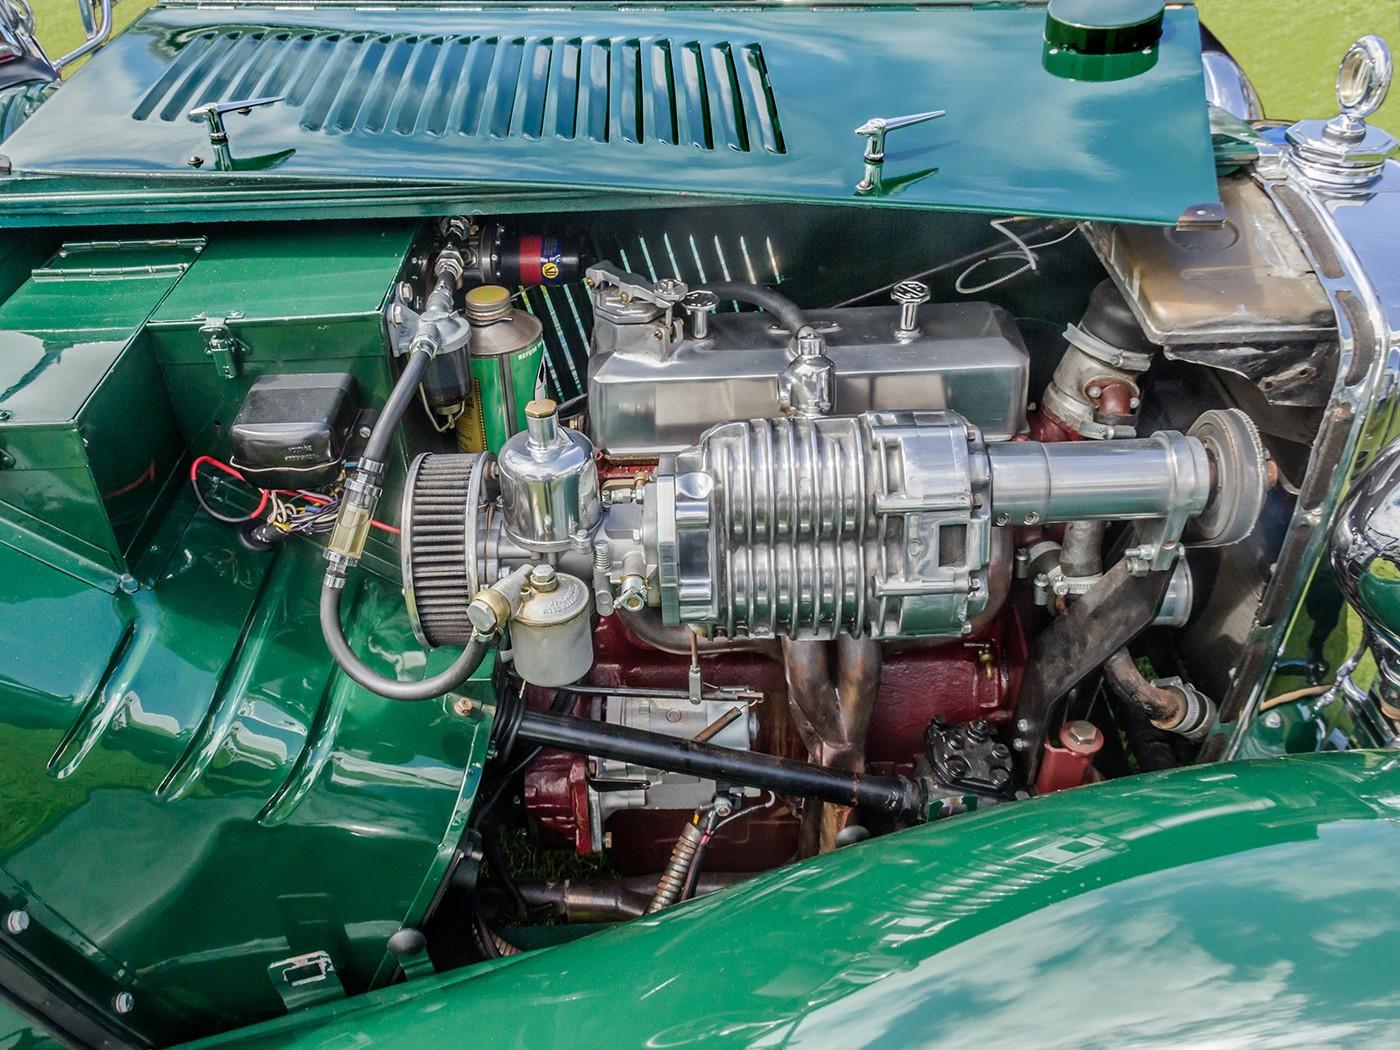 MG Classic car engine